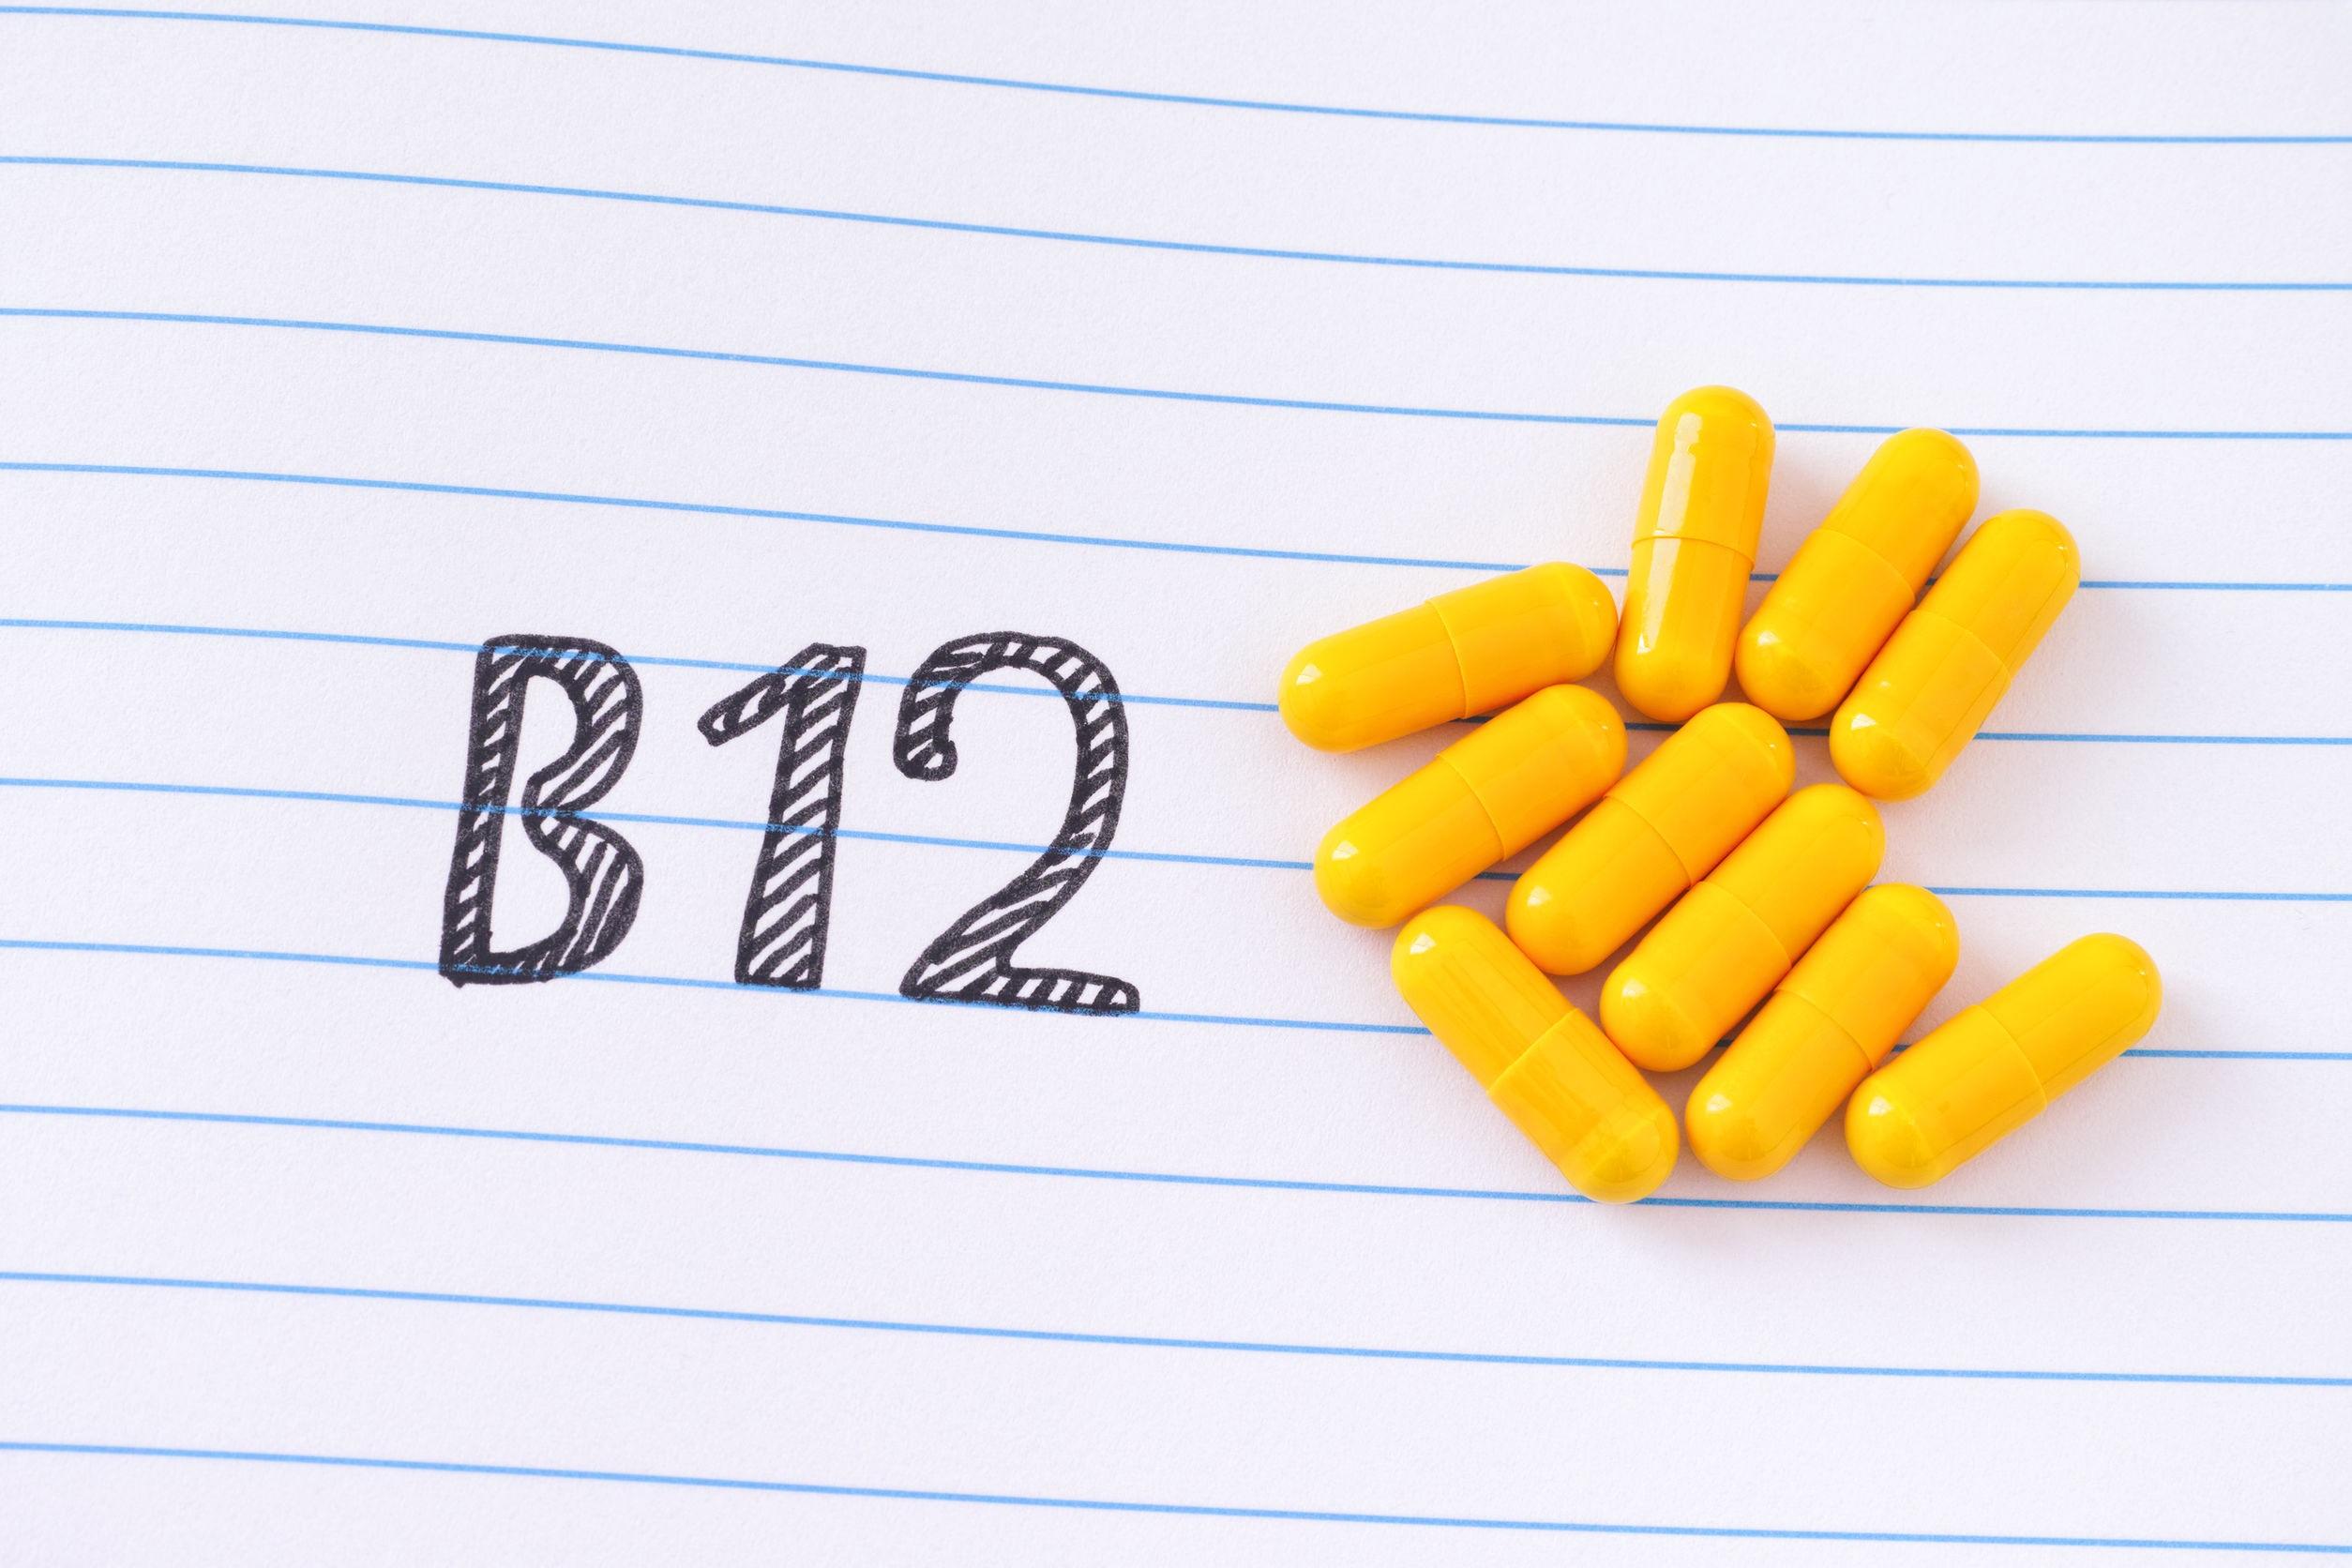 Witamina B12 tabletki